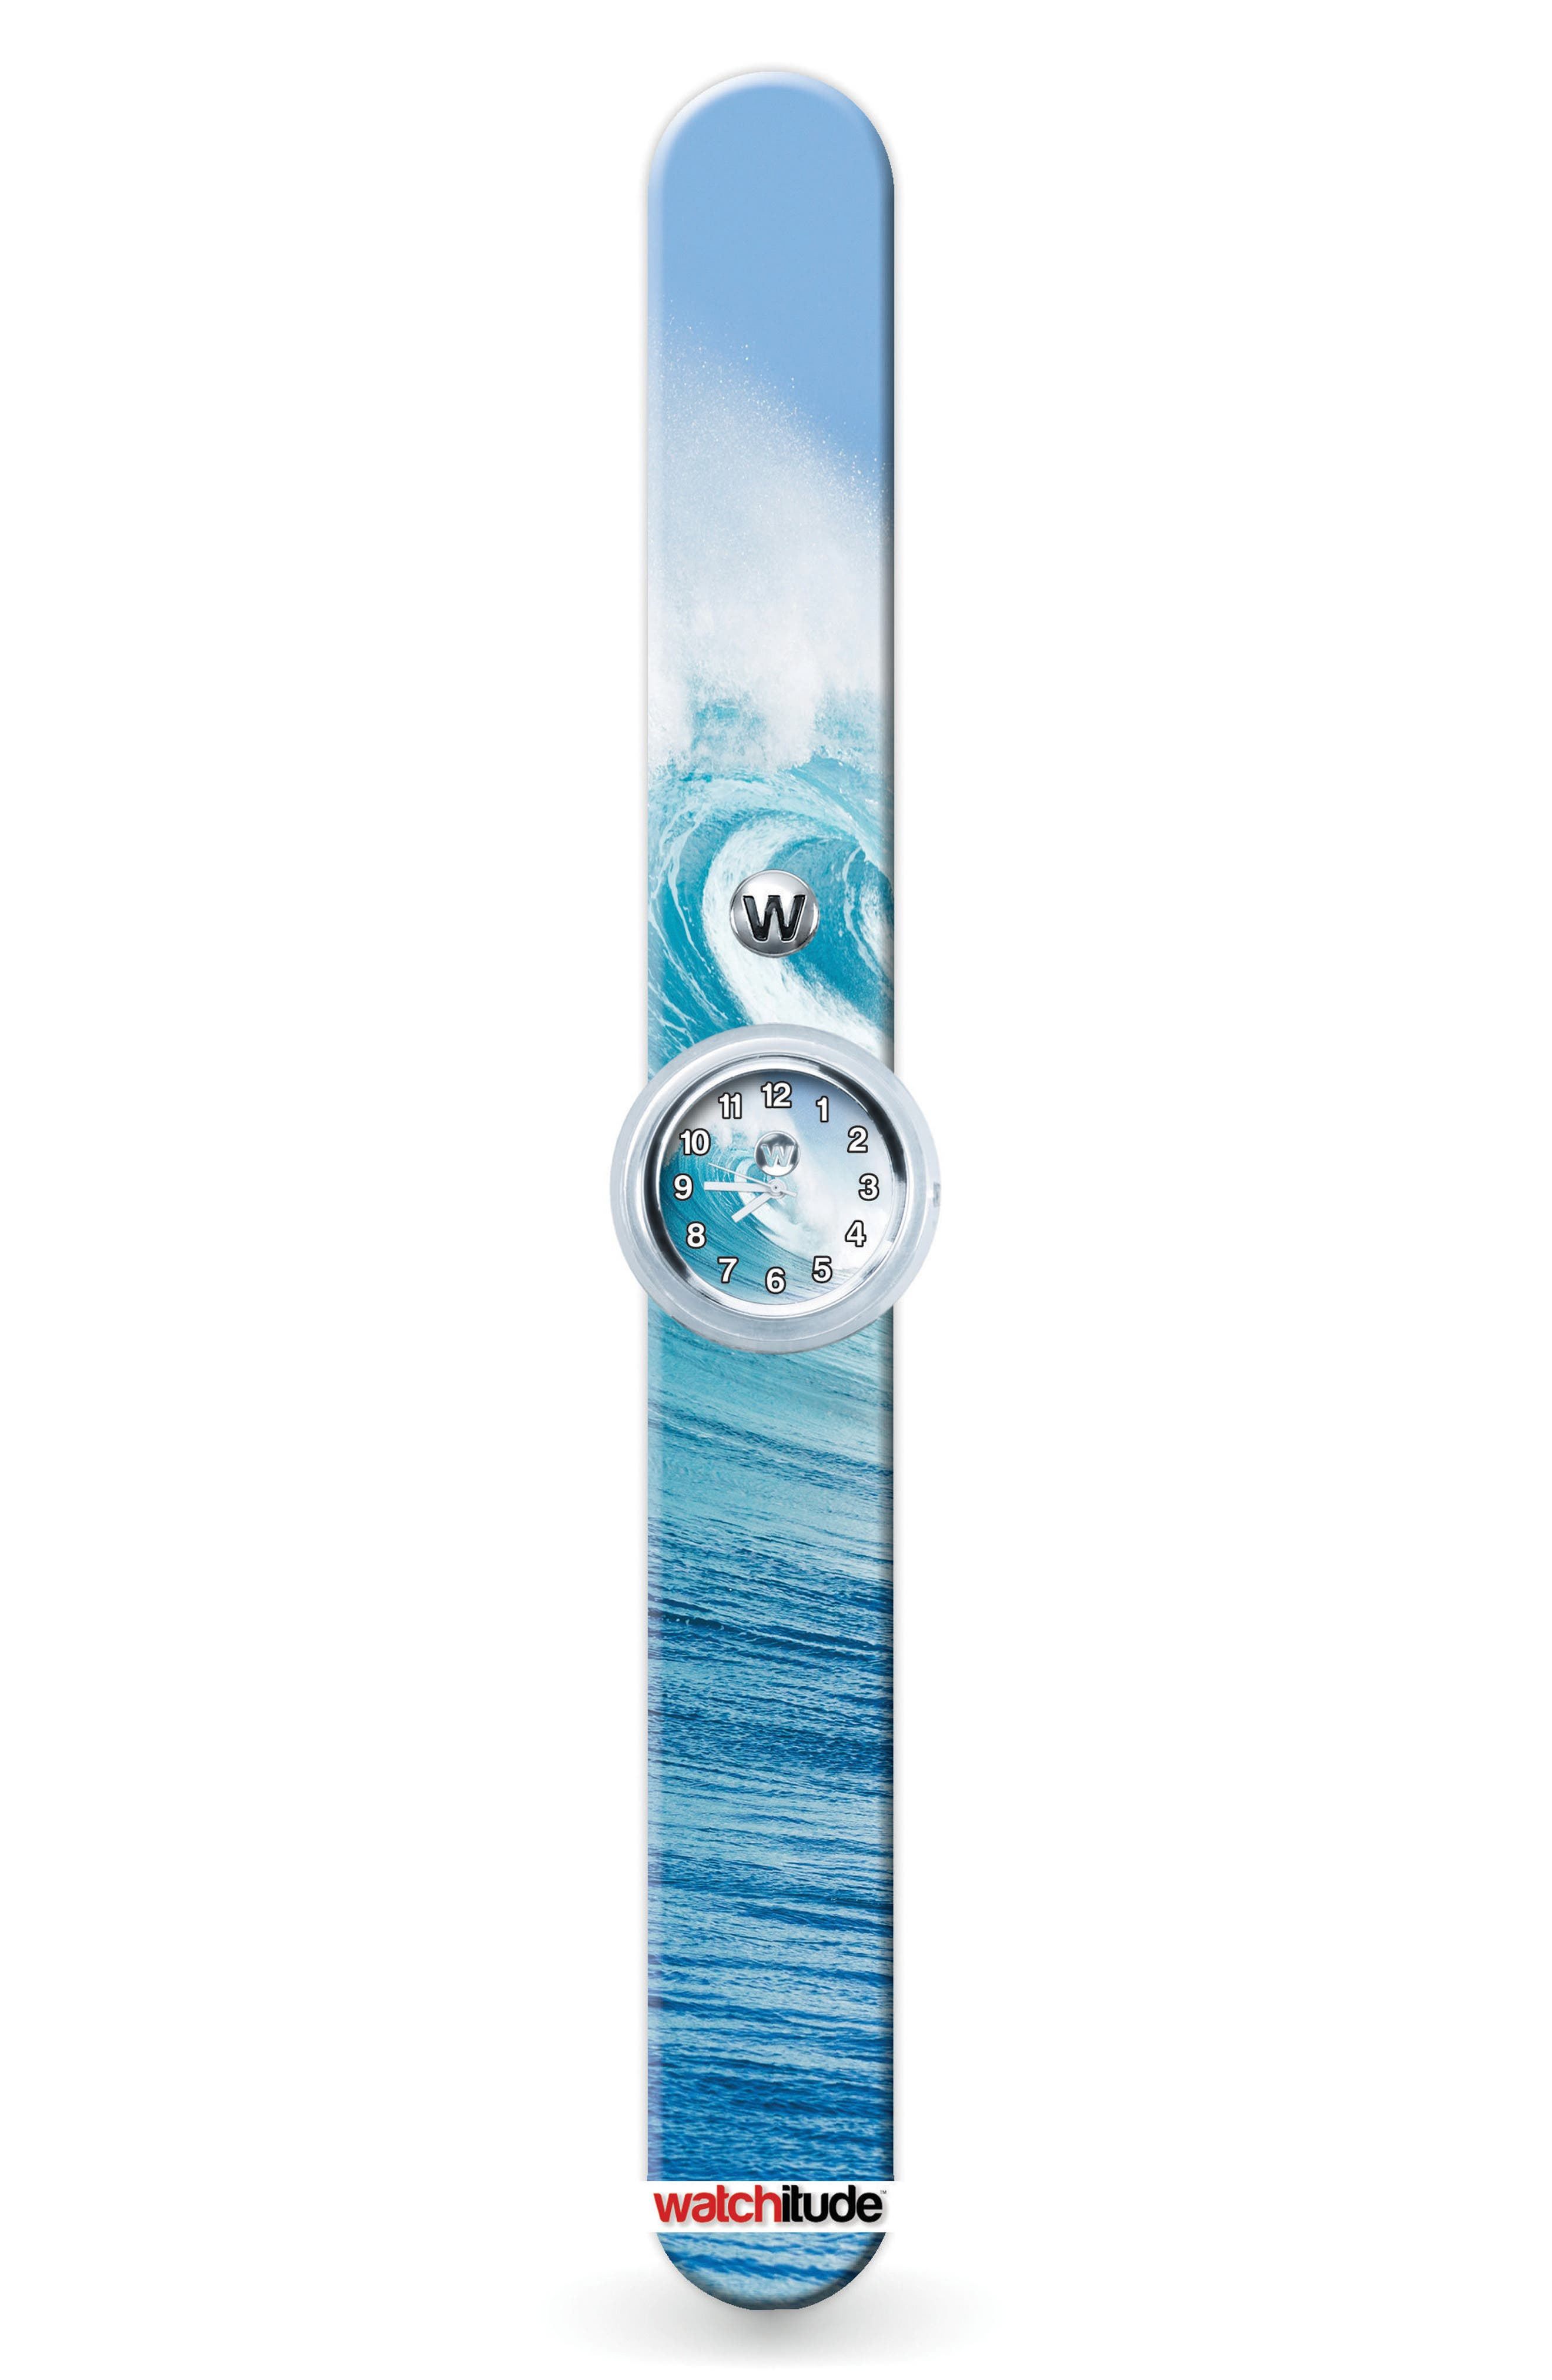 Alternate Image 1 Selected - watchitude Wave Shredder Slap Watch (Kids)